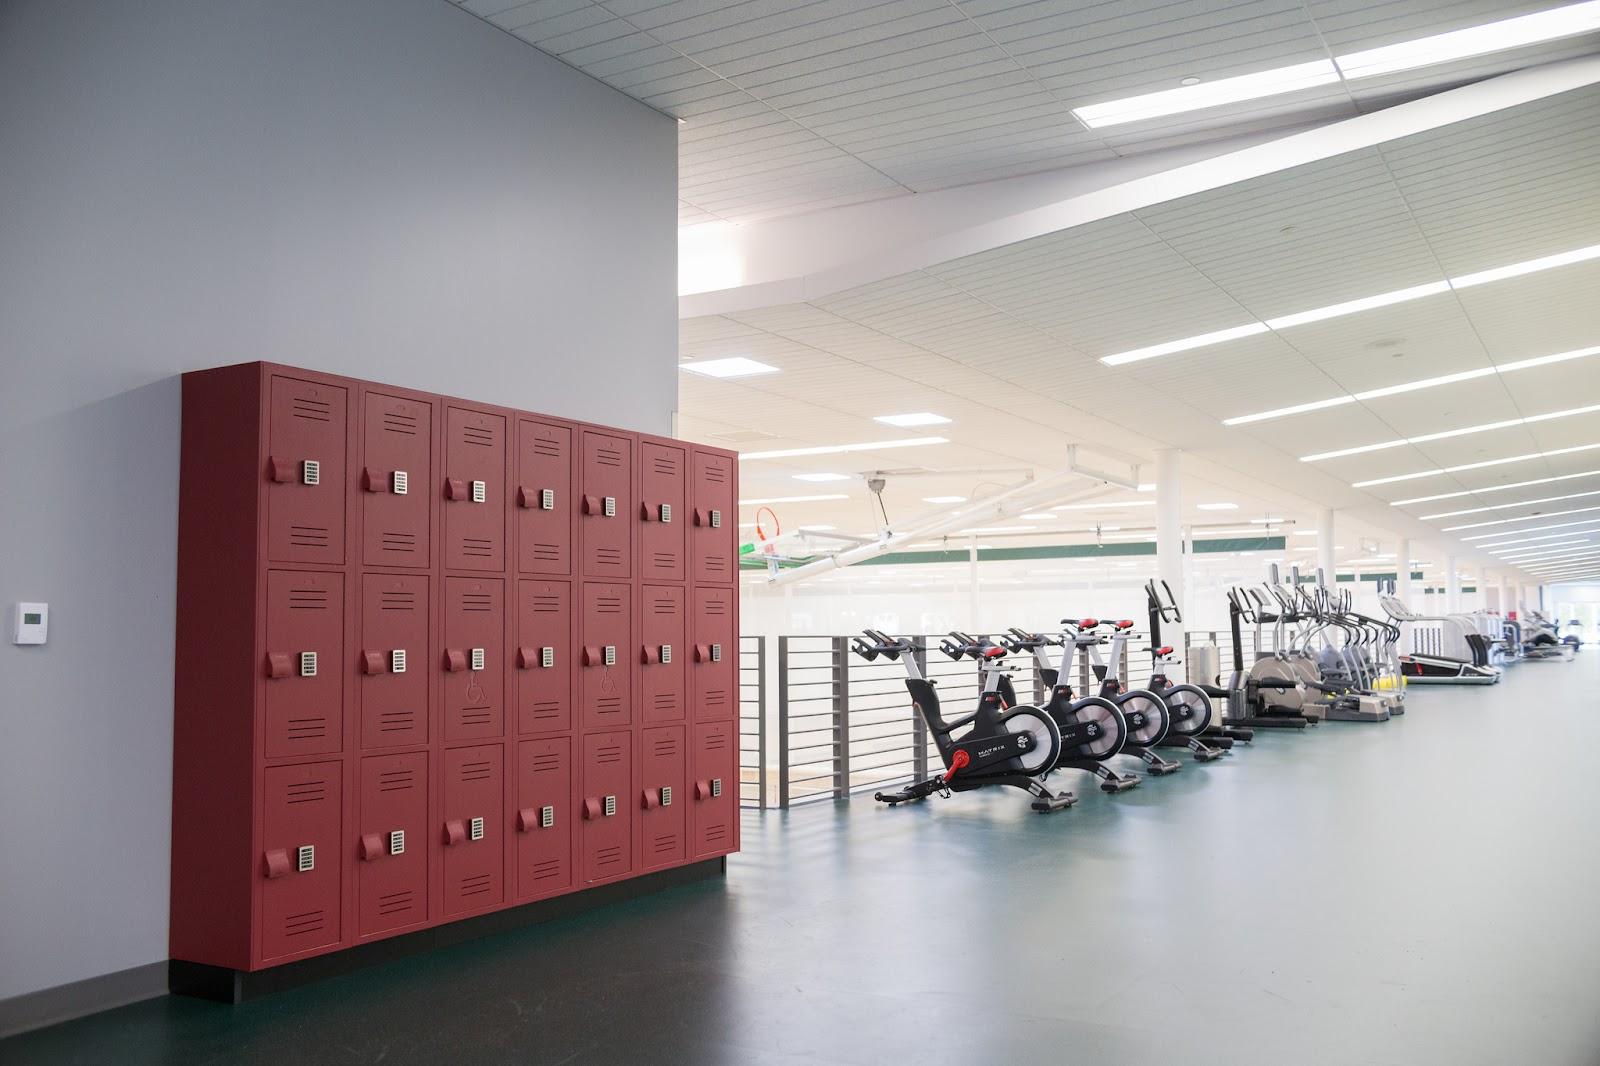 New lockers on the third floor